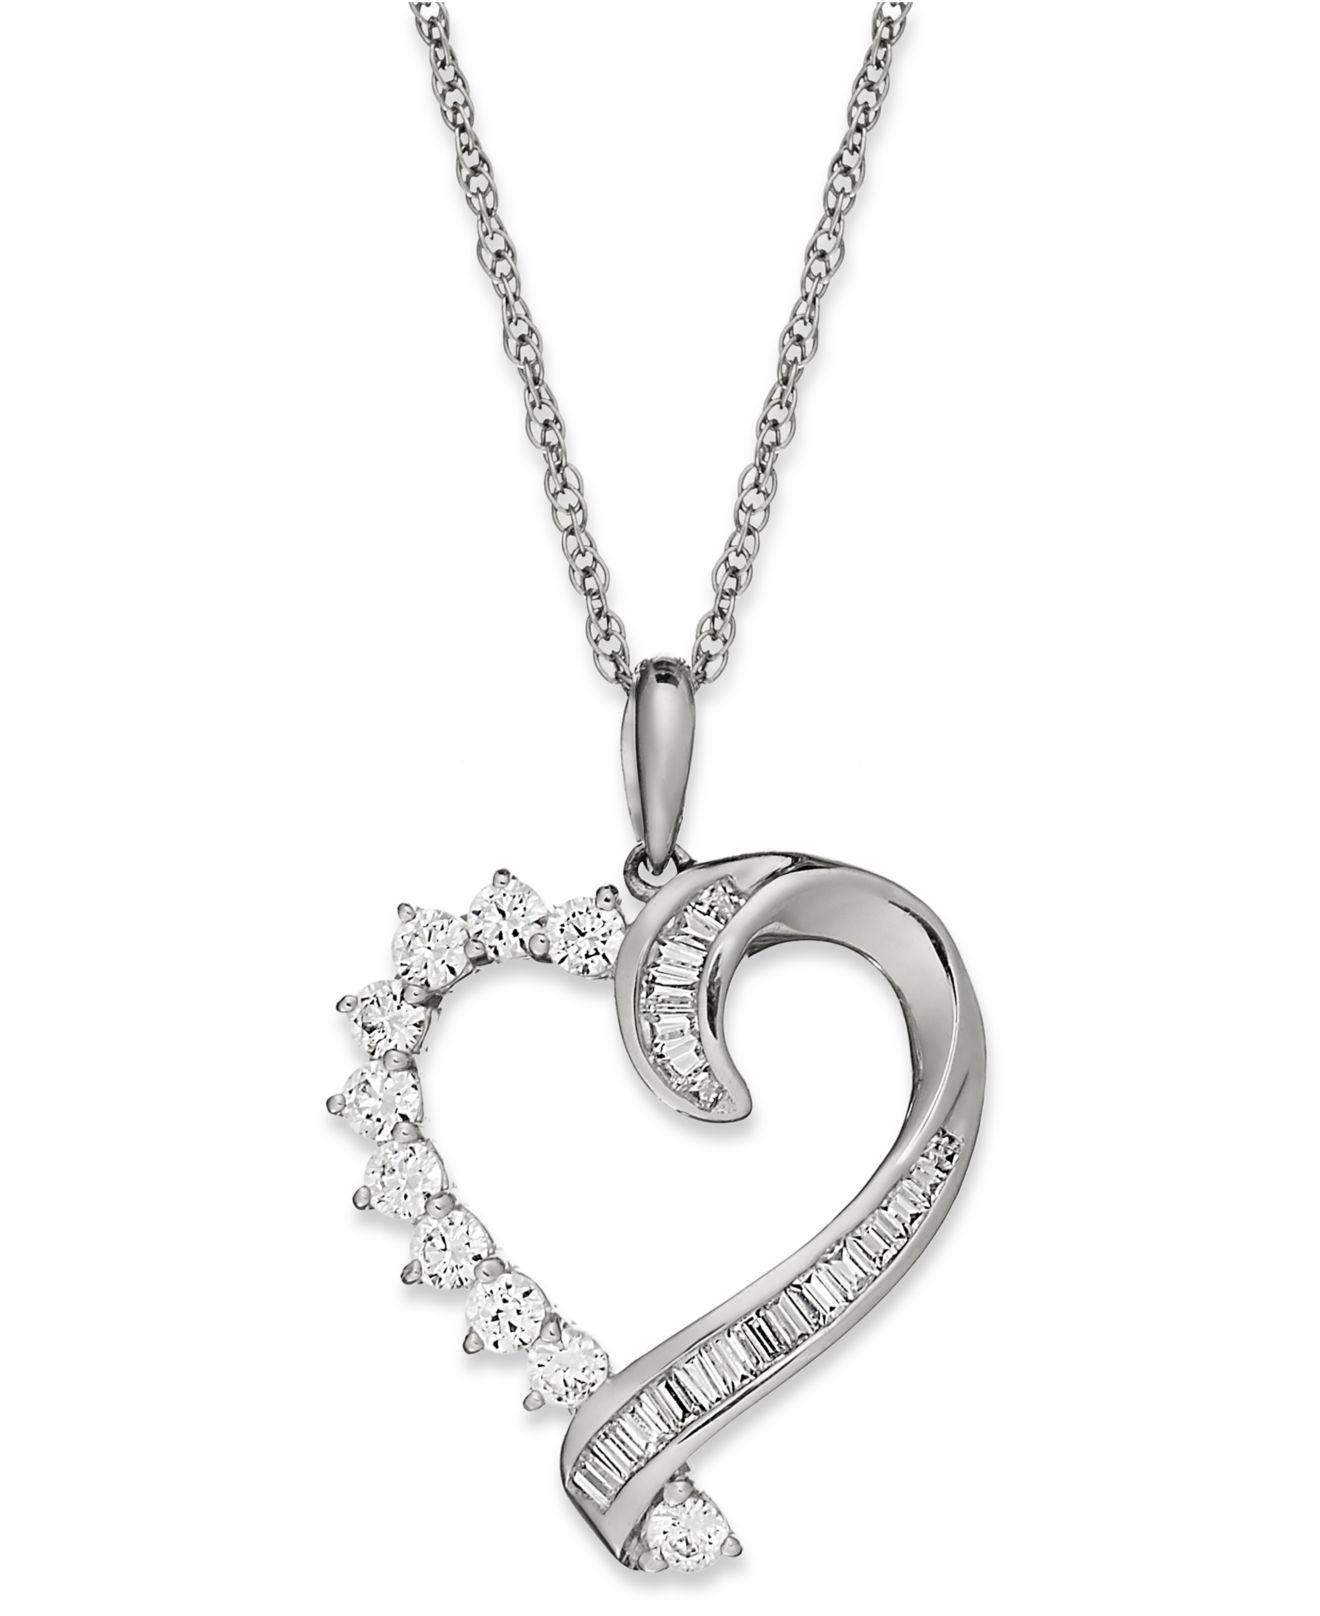 Lyst macys diamond baguette swirl heart pendant necklace in 10k macys diamond baguette swirl heart pendant necklace in 10k white gold 12 view fullscreen mozeypictures Gallery